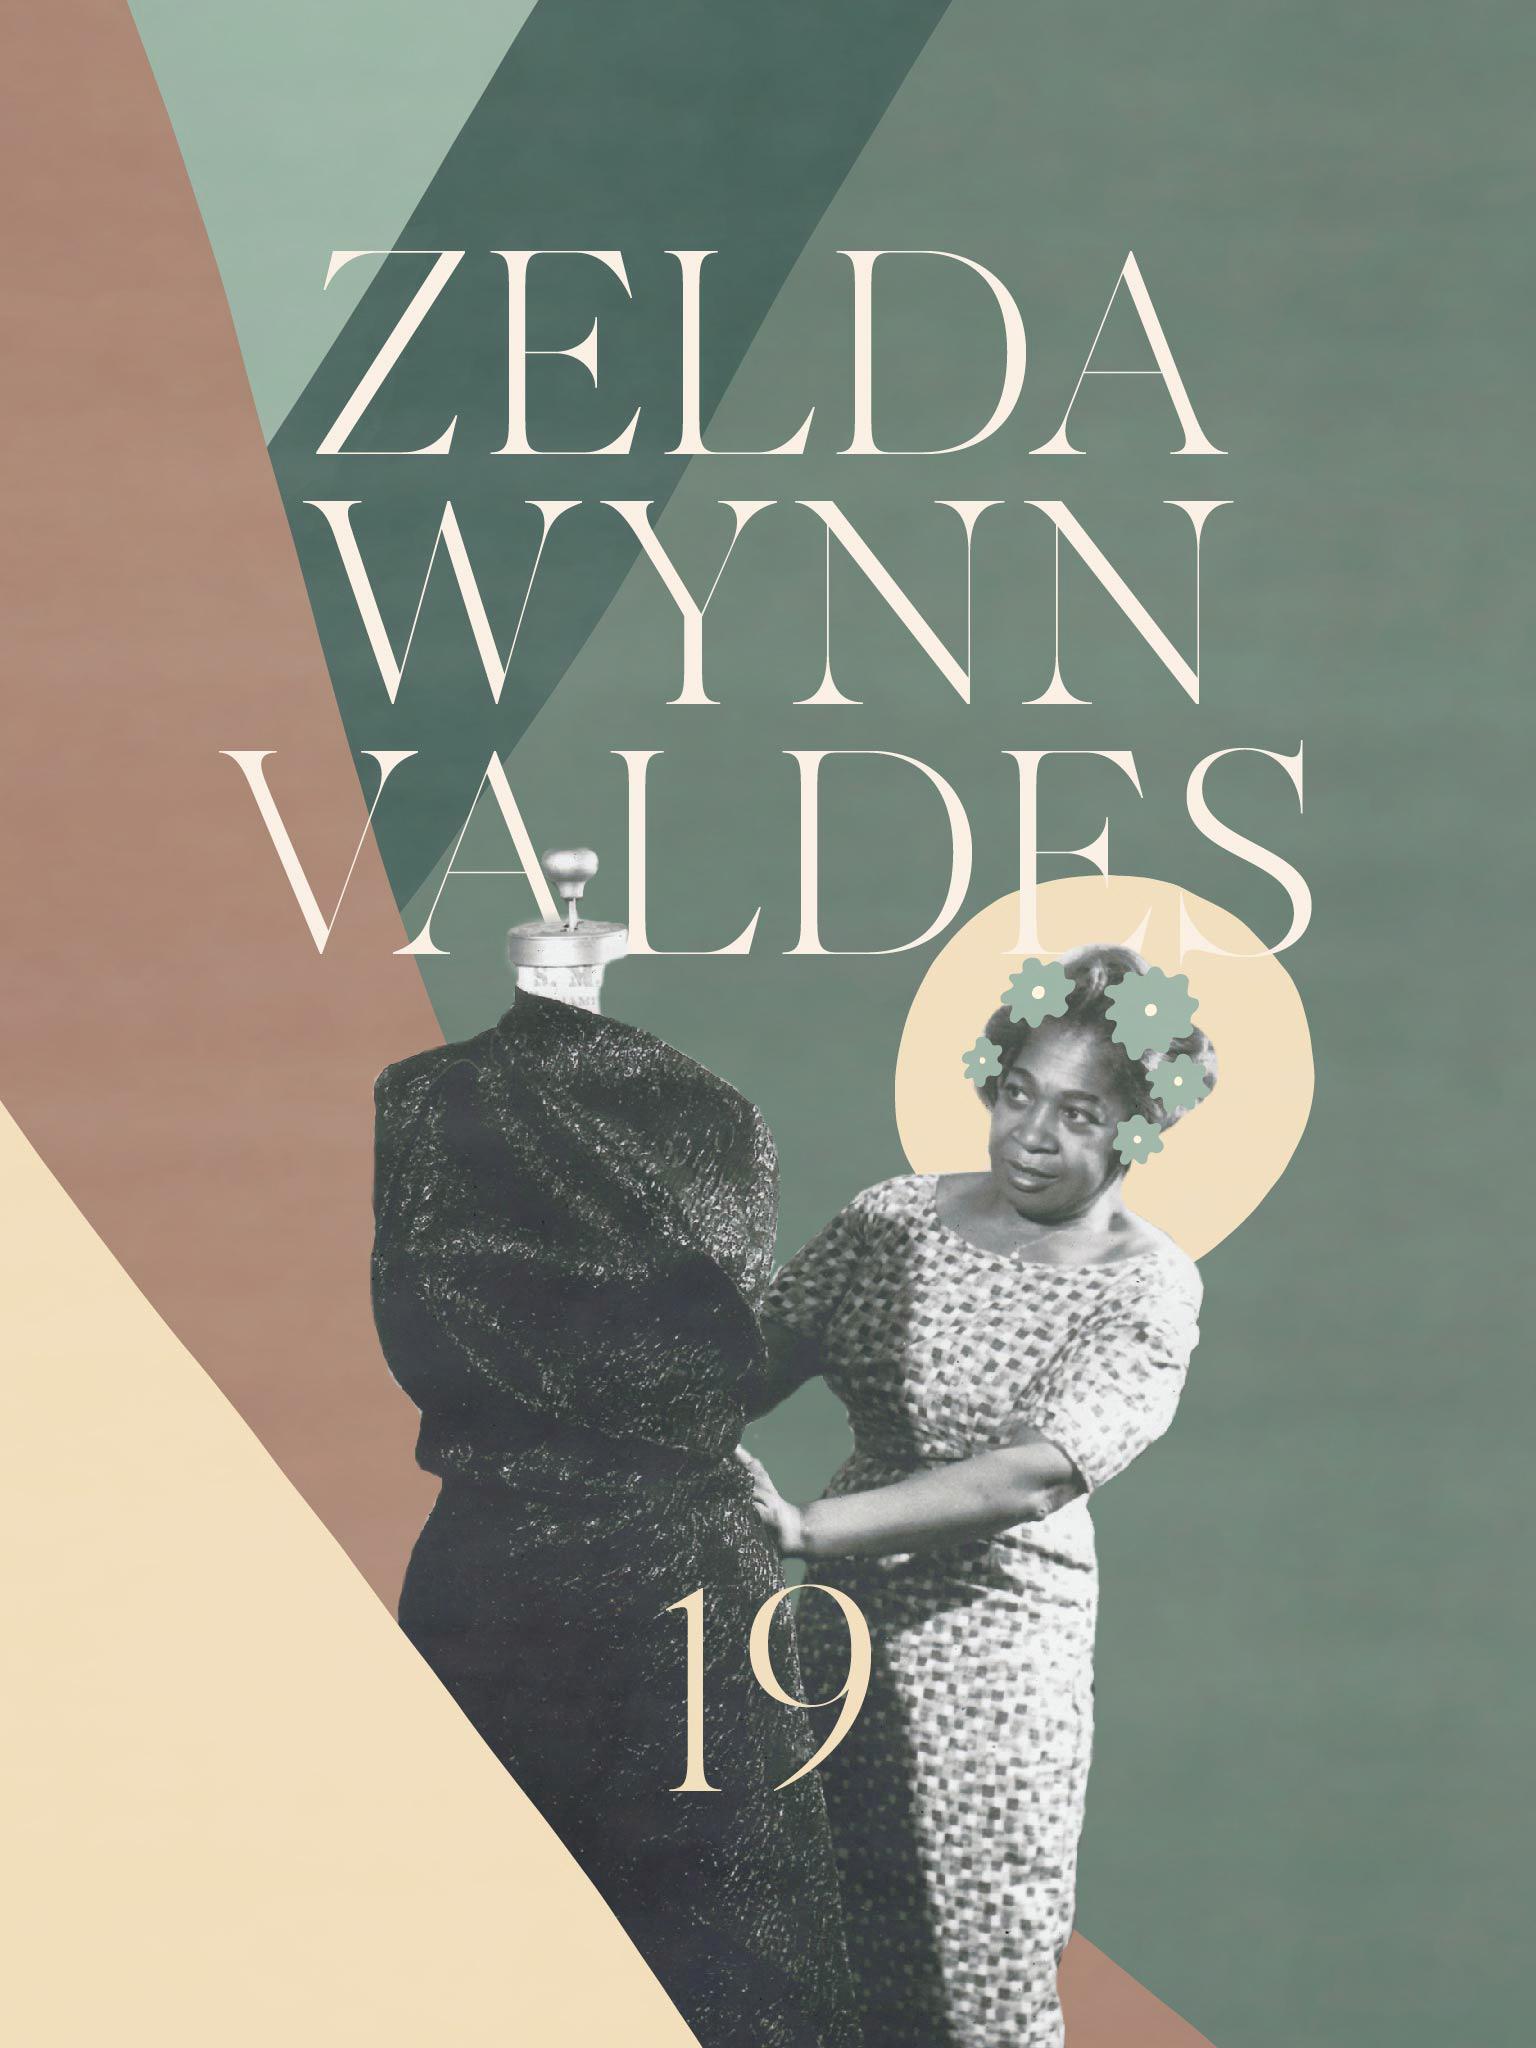 19zeldawynnvaldes-01.jpg